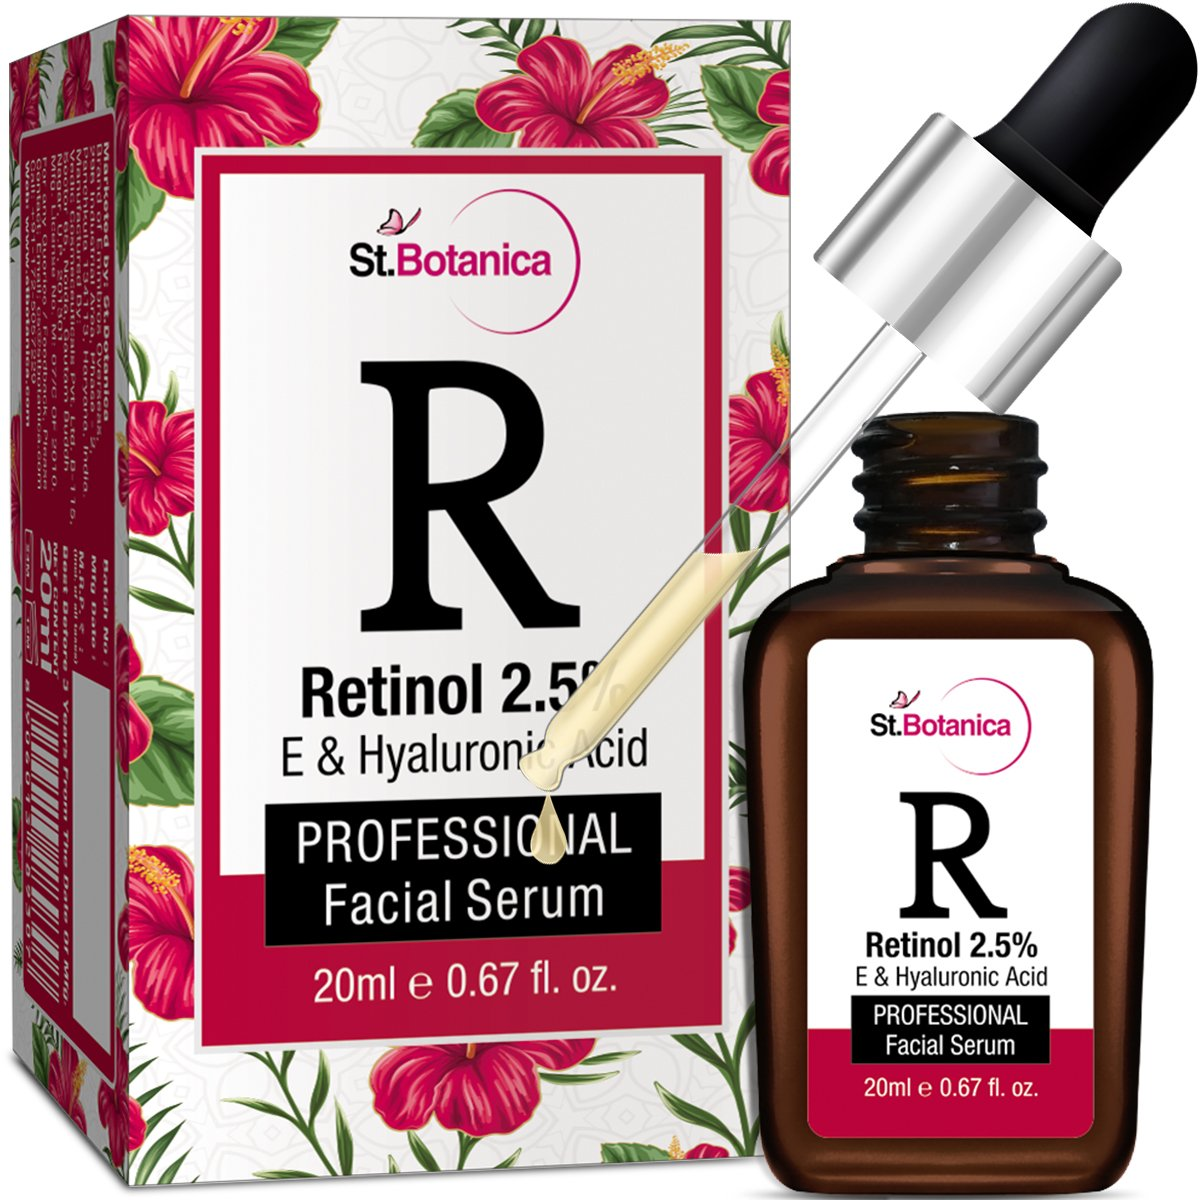 StBotanica Retinol 2.5% + Vitamin E, C & Hyaluronic Acid Professional Facial Serum - 20ml - Anti Aging/Wrinkle Serum, Skin Whitening Serum product image